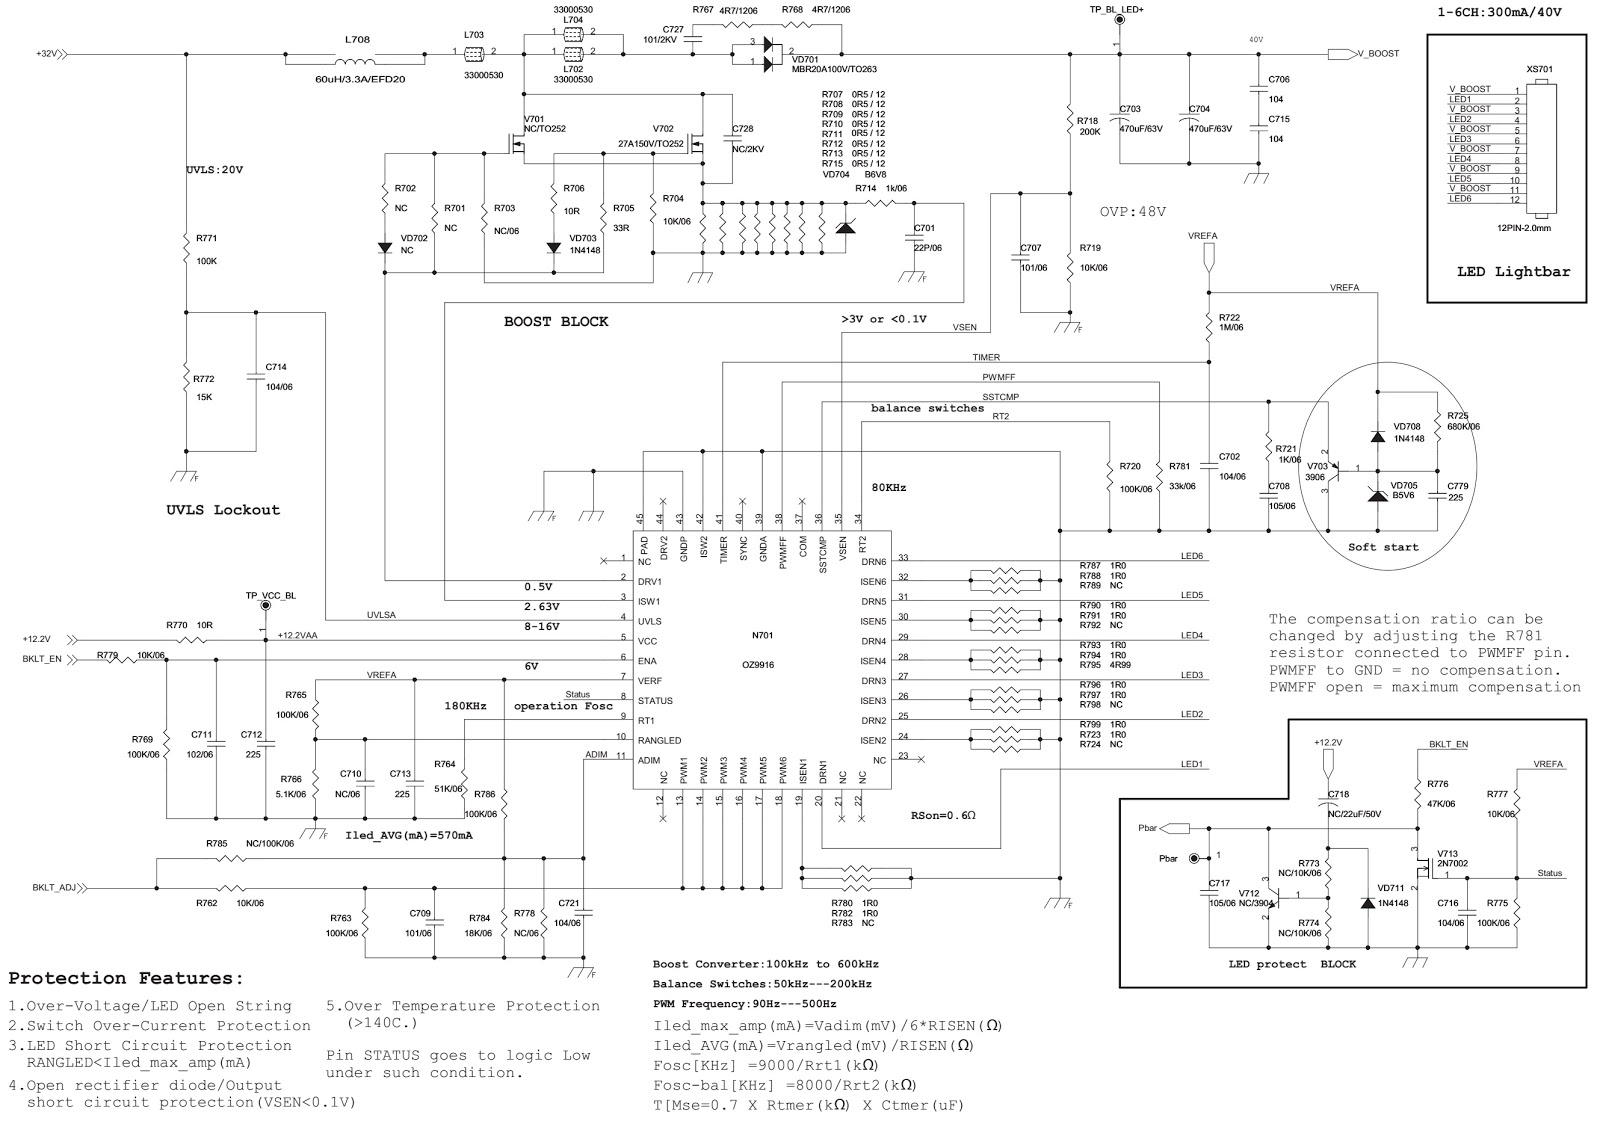 Schematic Diagrams  Toshiba 48l2400  U2013 Dl4845i  U2013 Smps And